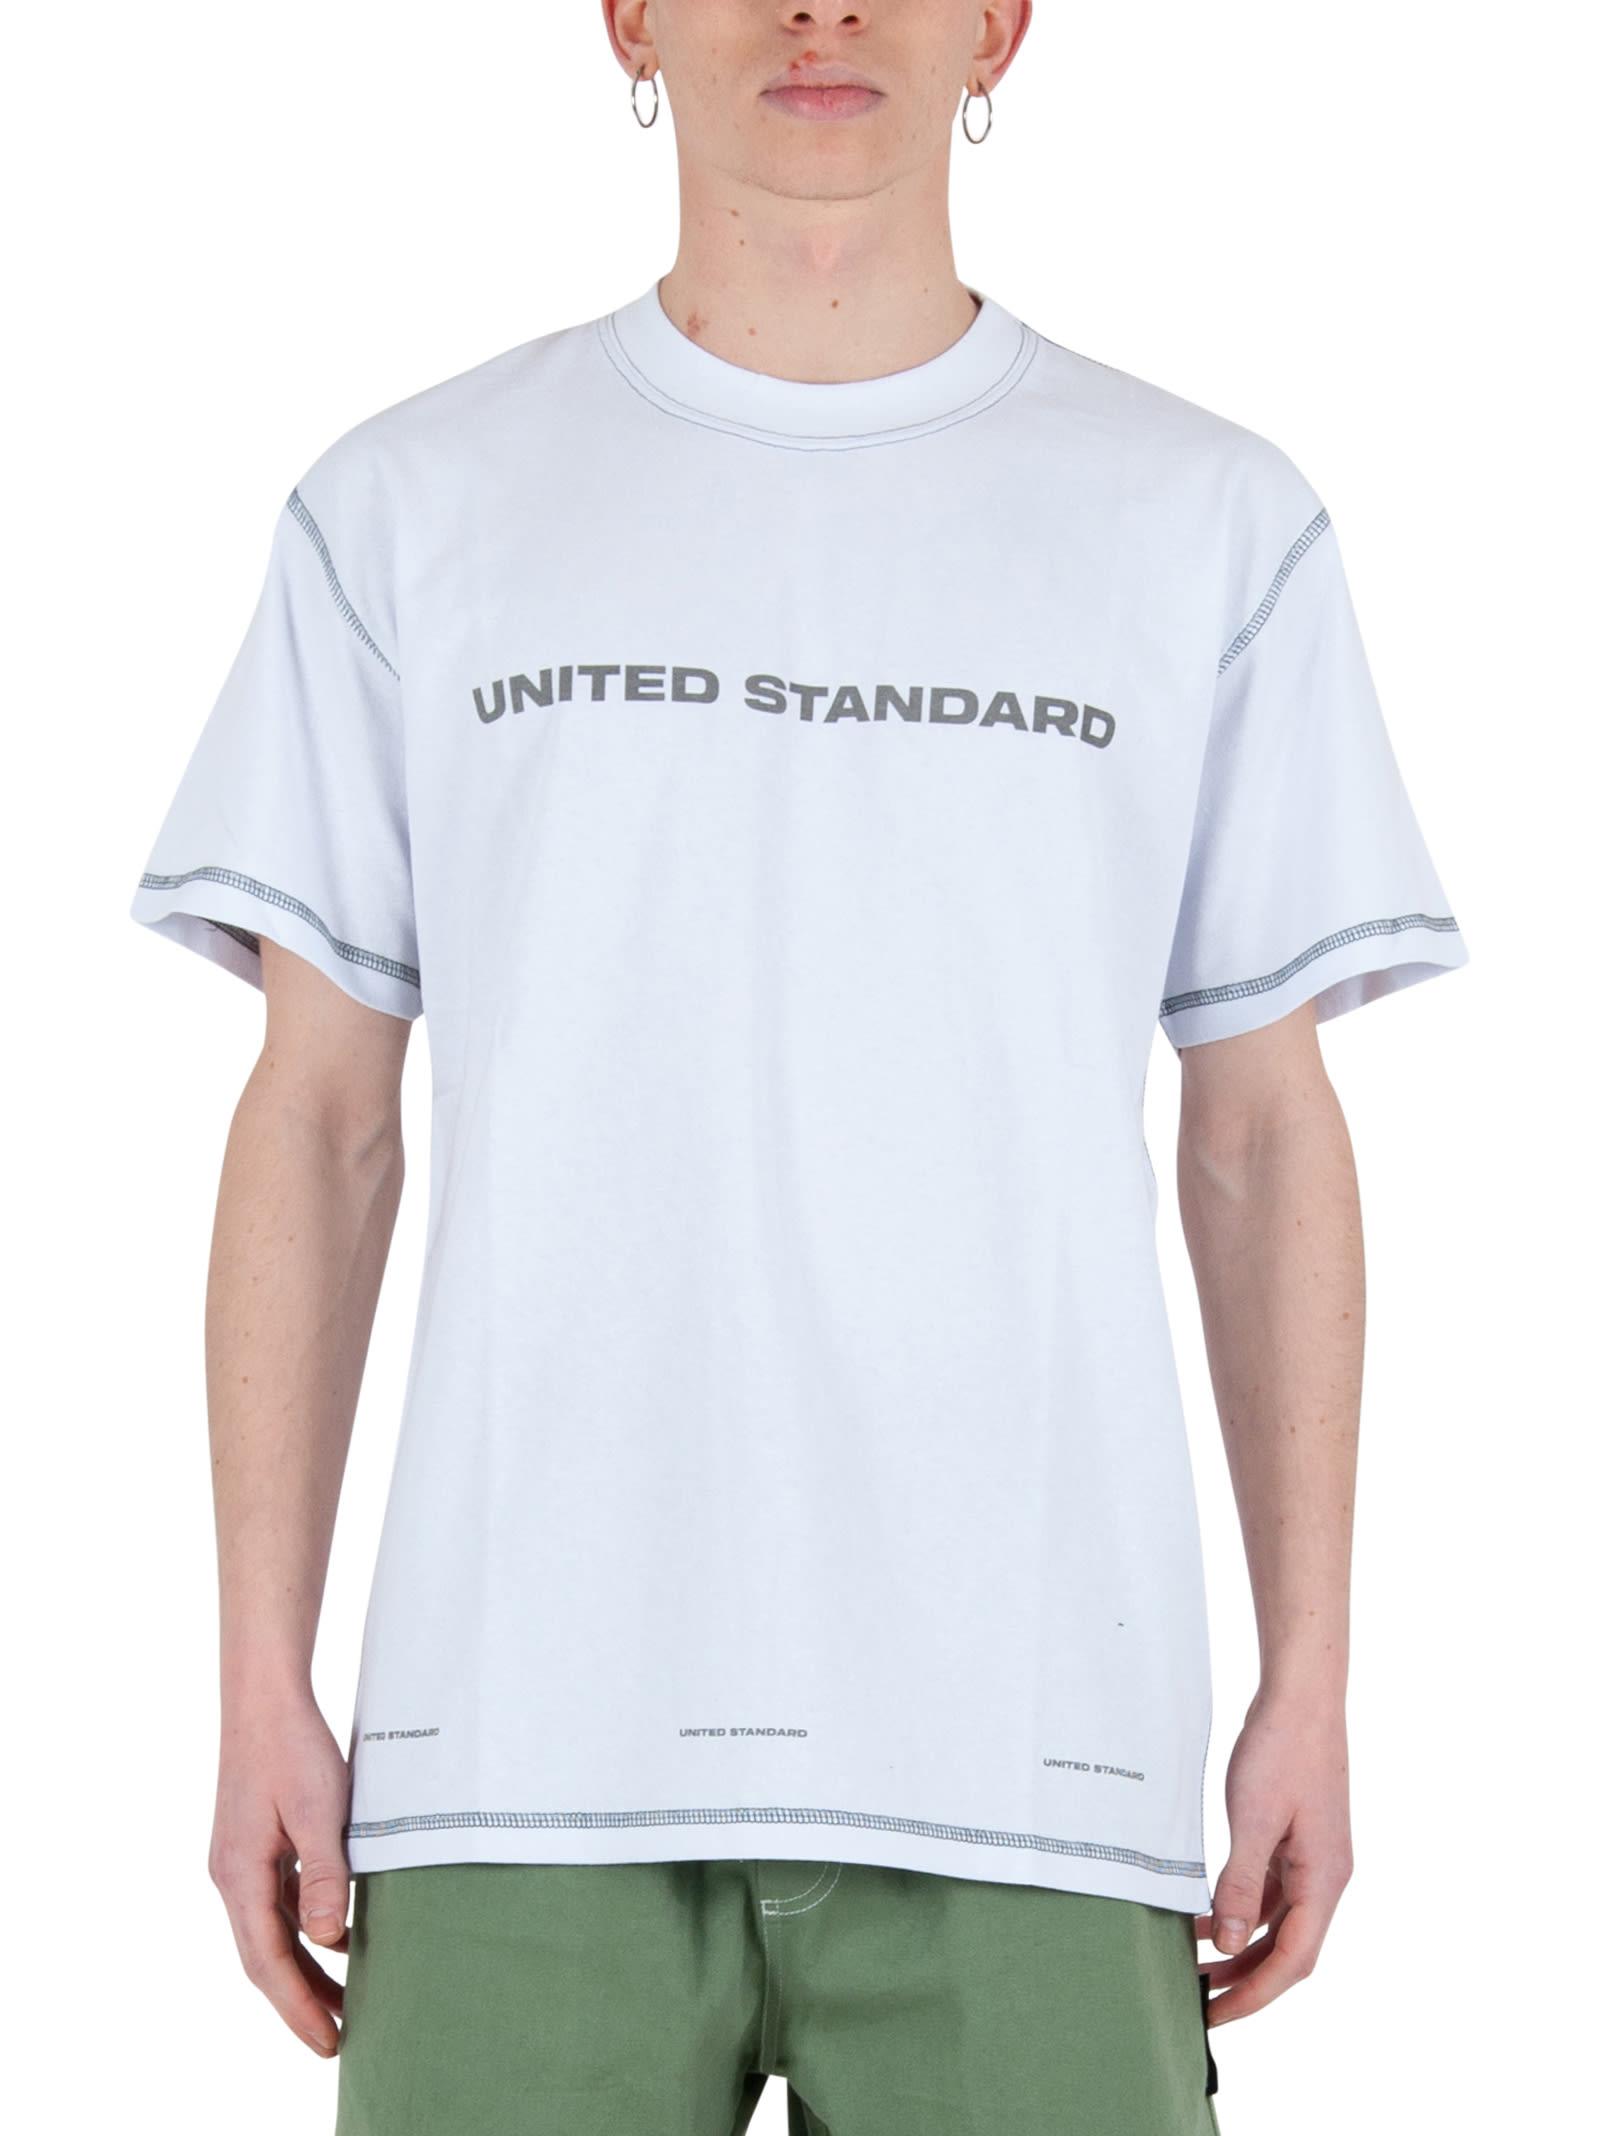 United Standard LOGO TEE